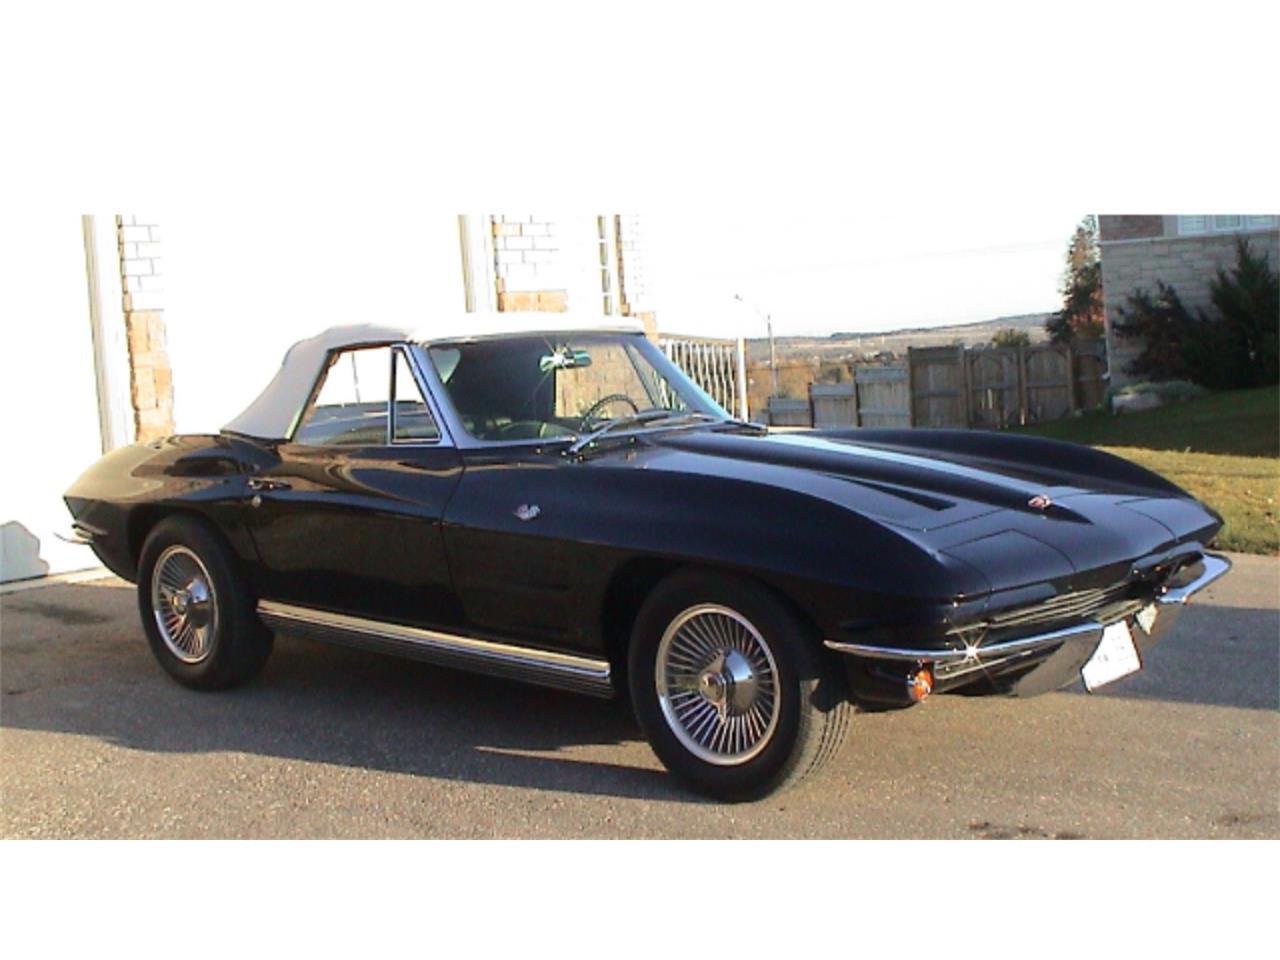 1964 Chevrolet Corvette Stingray (CC-1314448) for sale in Innisfil, Ontario